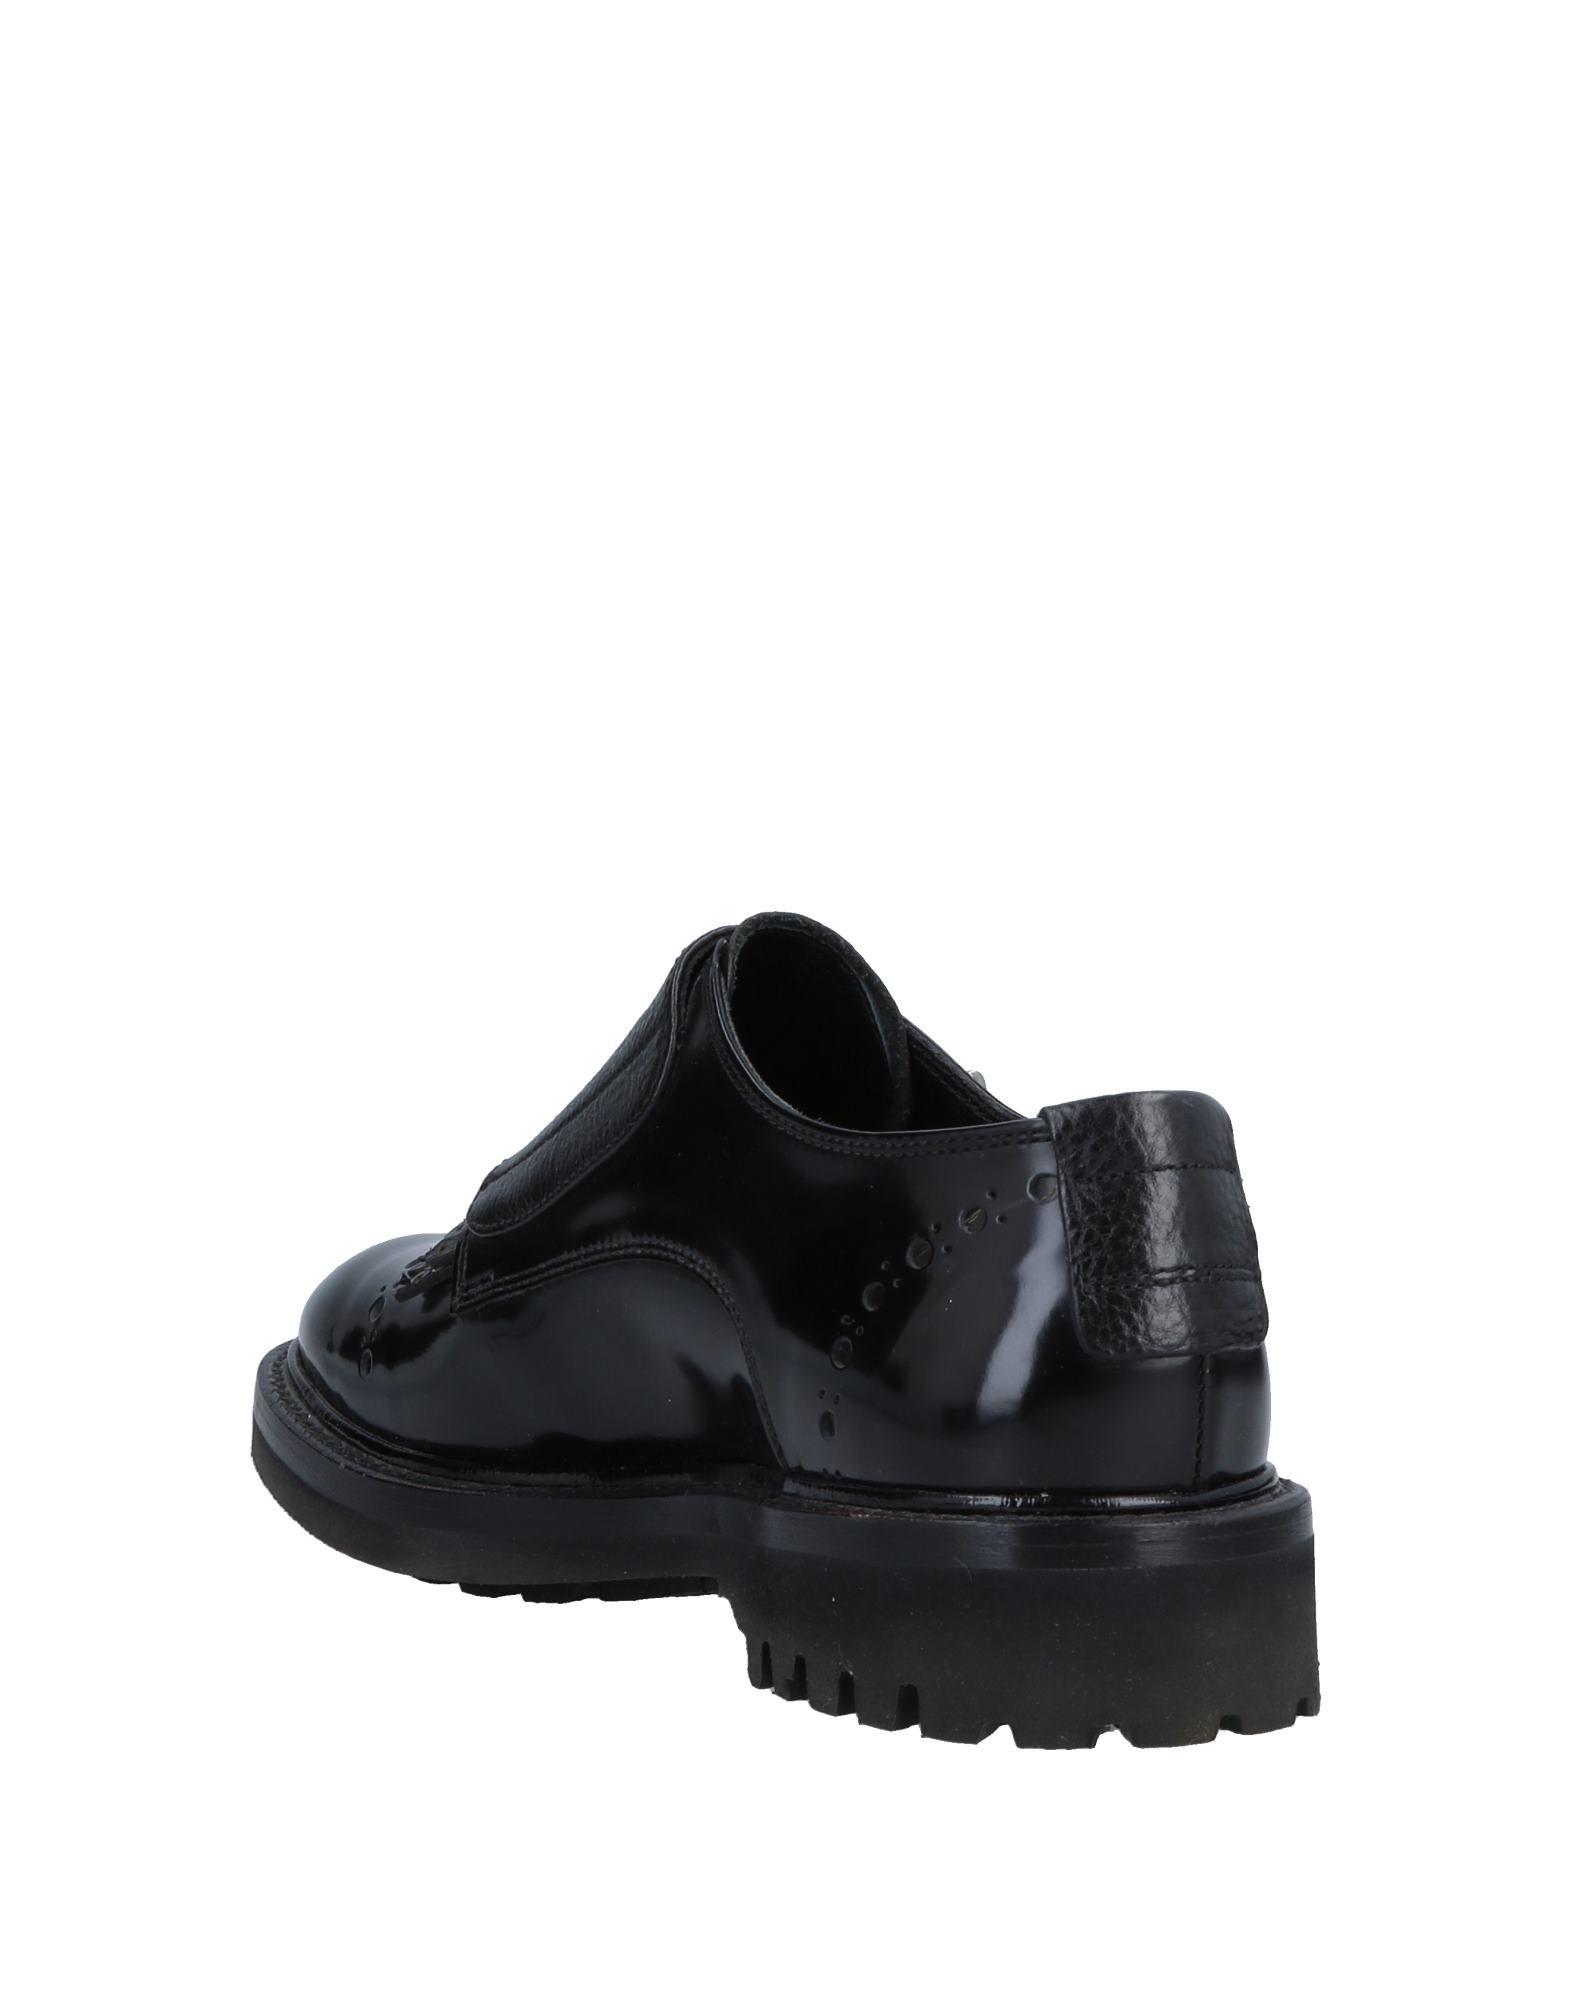 Stilvolle Barracuda billige Schuhe Barracuda Stilvolle Mokassins Damen  11567226DG 11b0a2